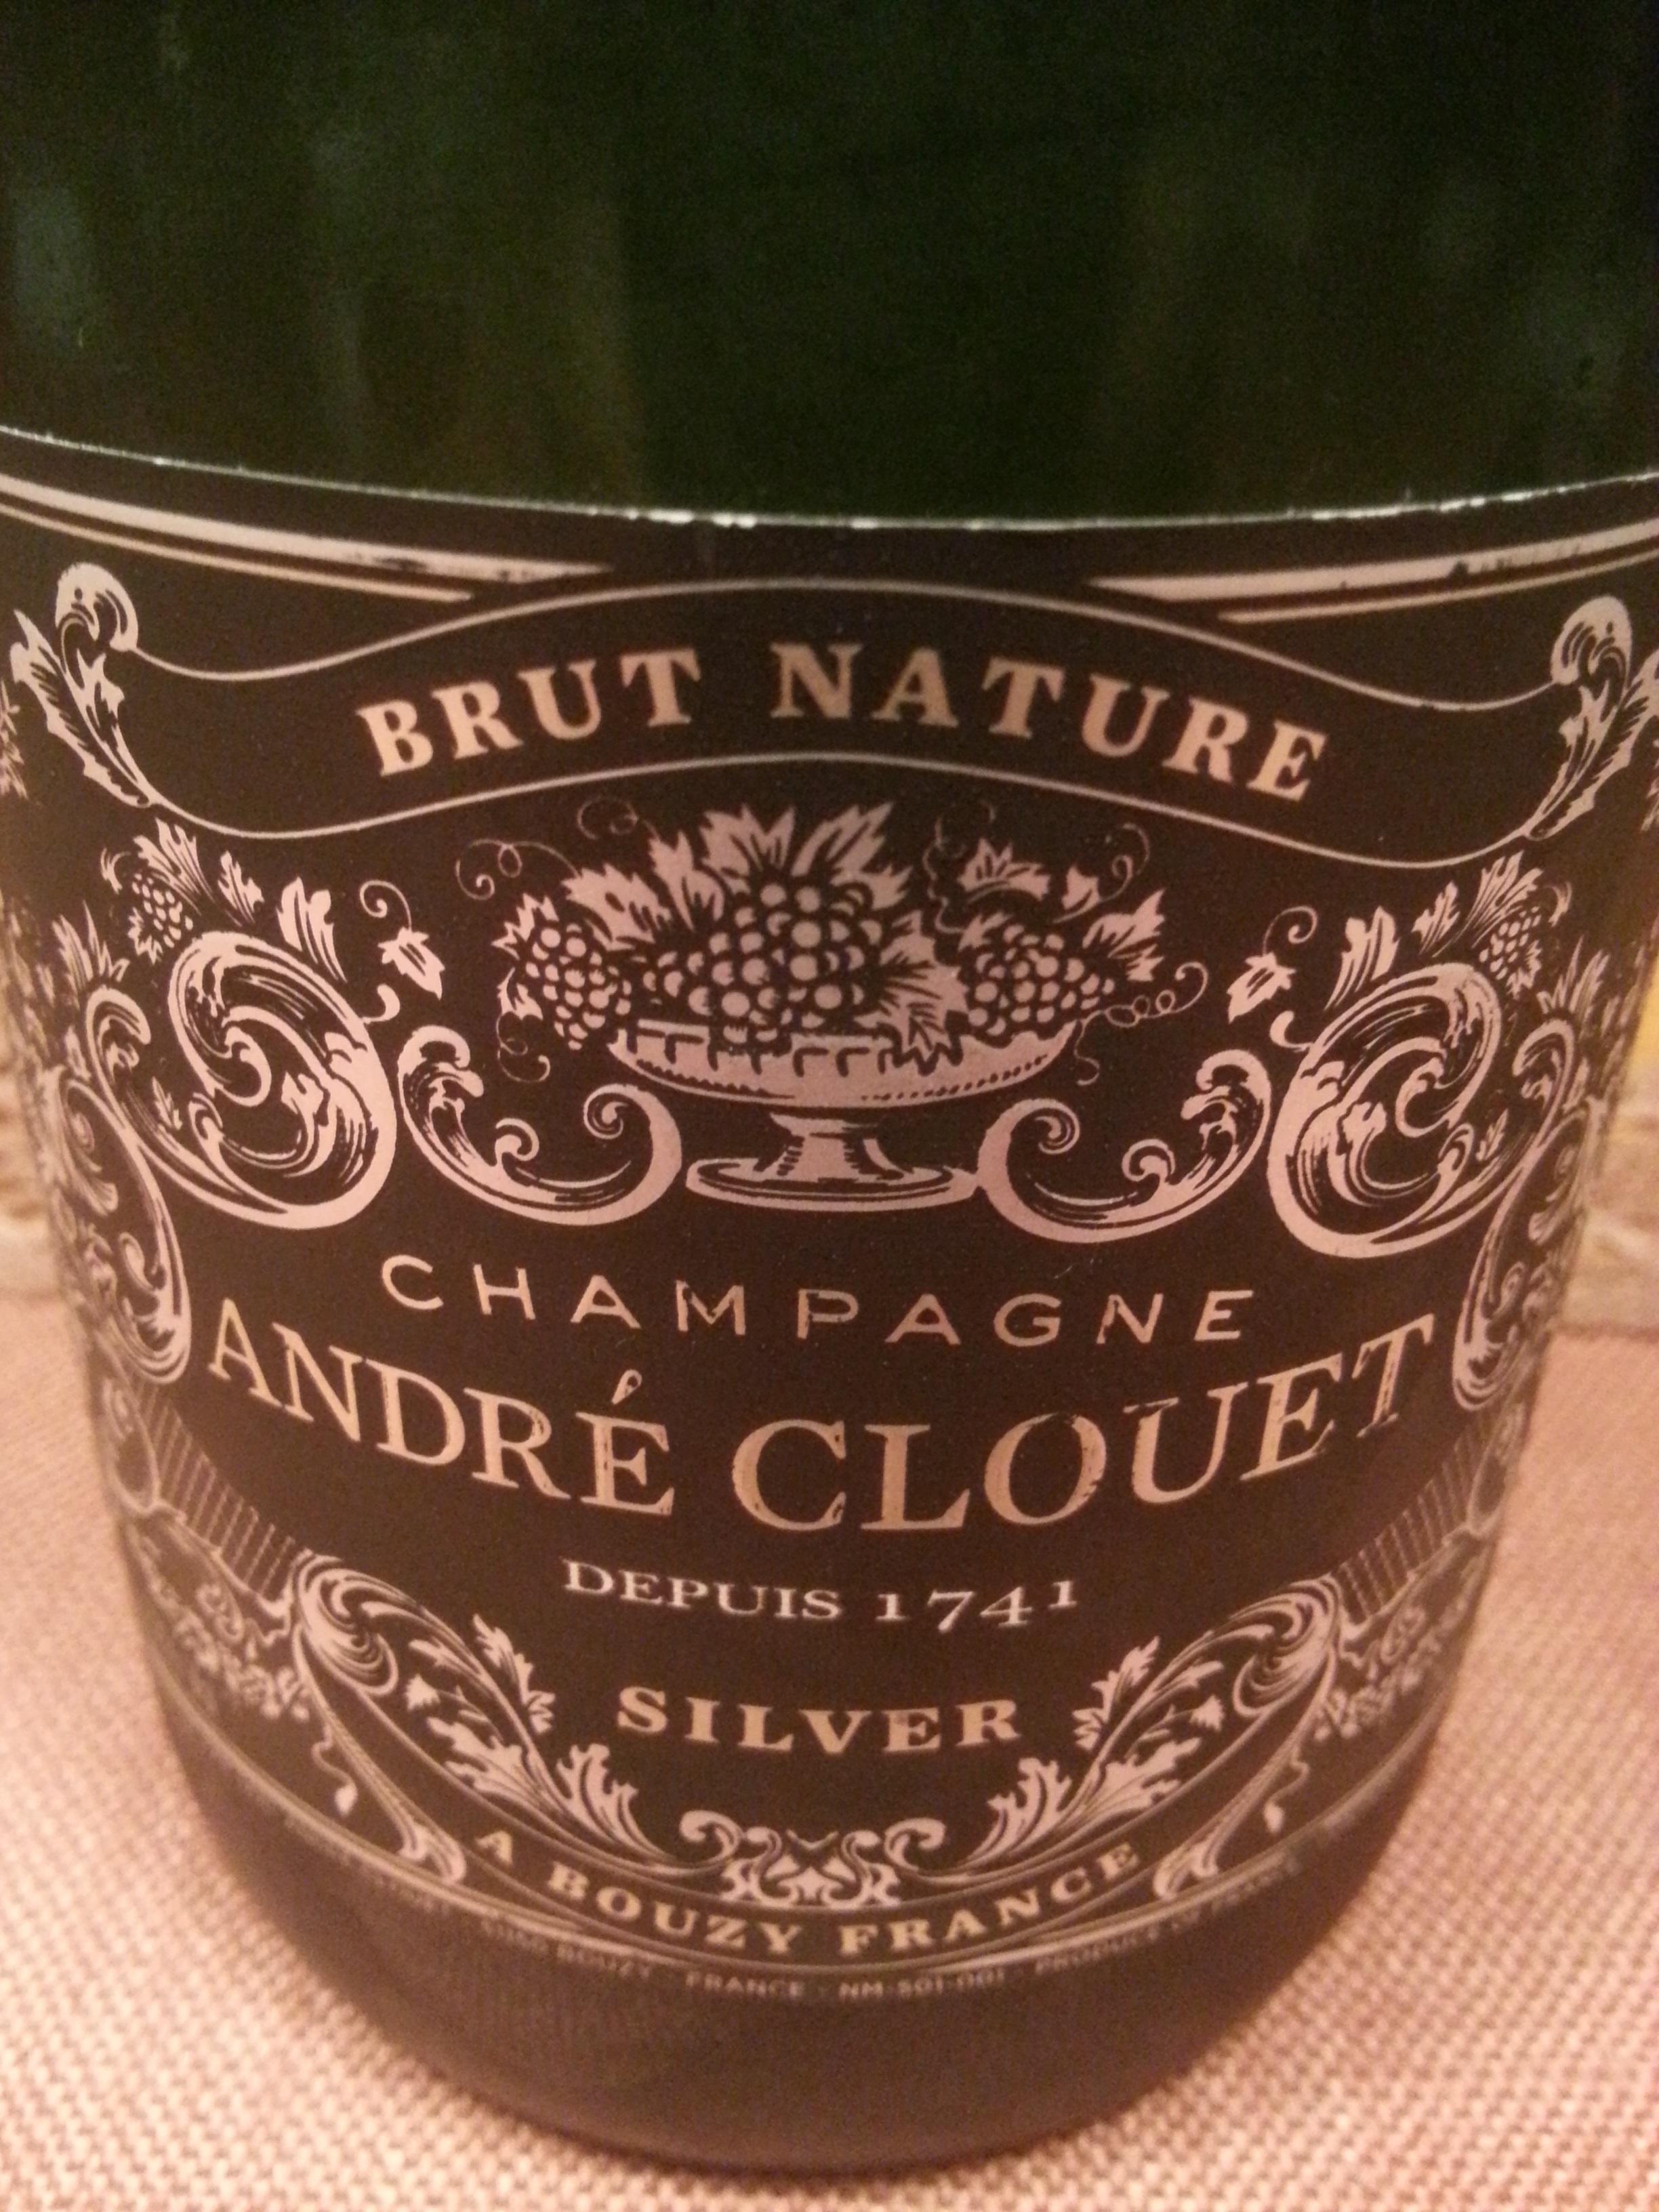 -nv- Champagne Brut Nature | Clouet